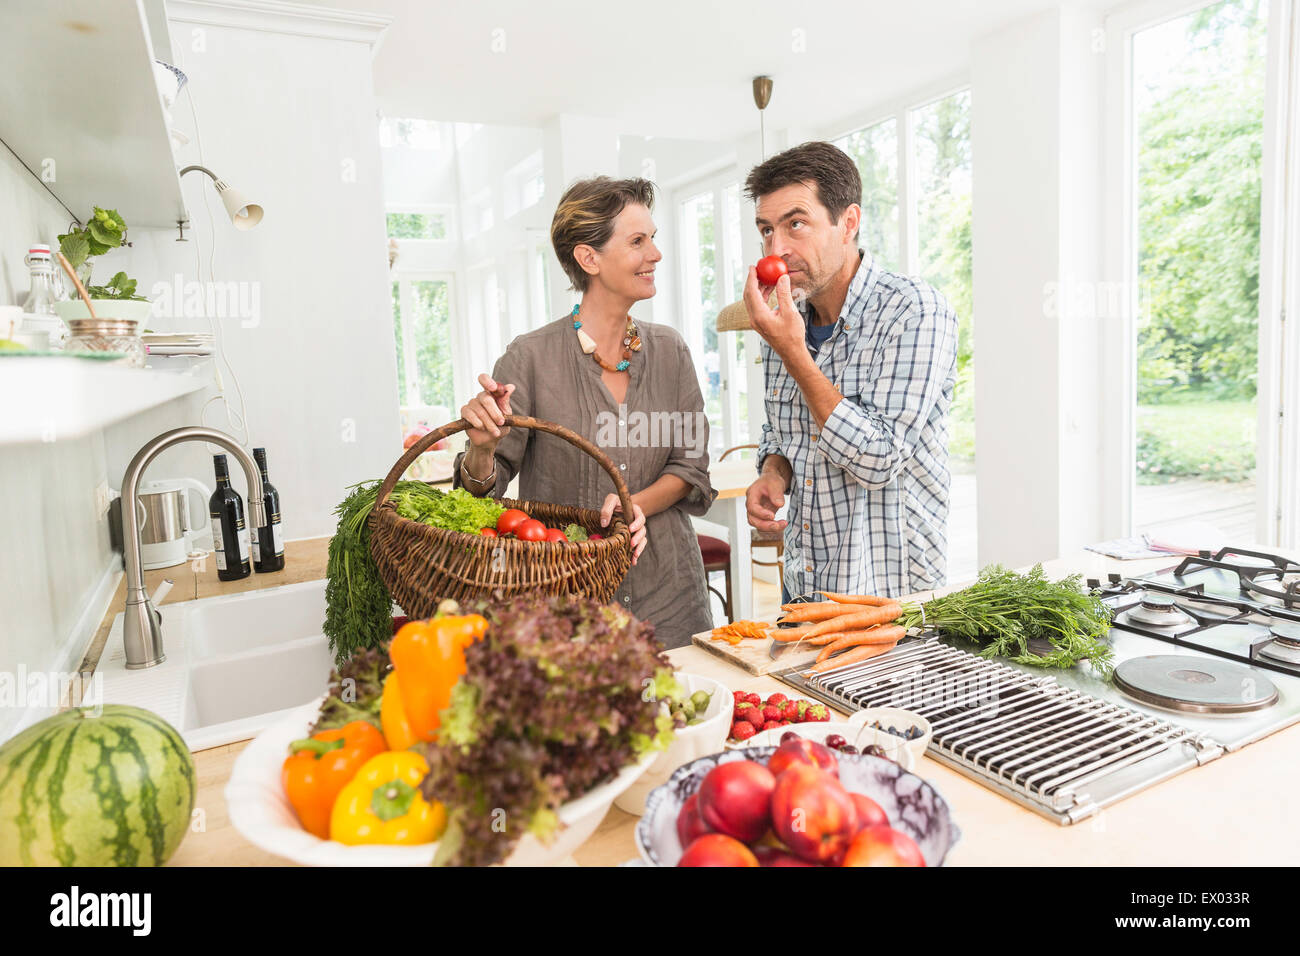 Couple in kitchen preparing fresh vegetables - Stock Image